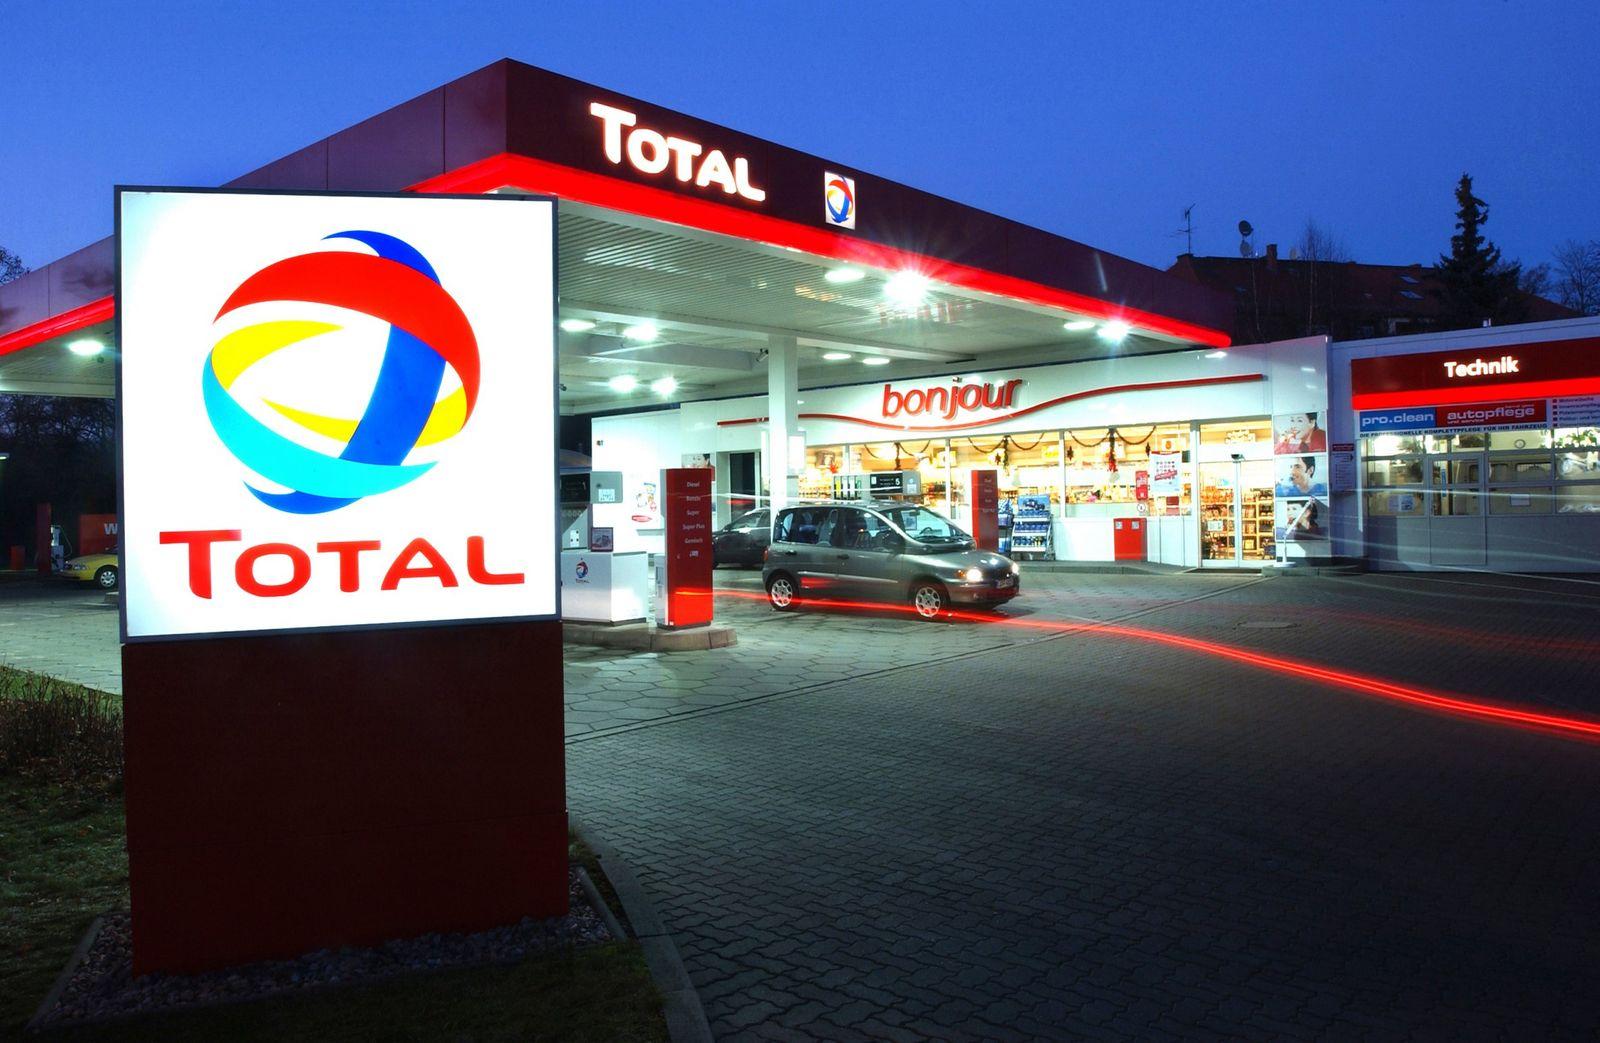 TOTAL Tankstelle in Leipzig